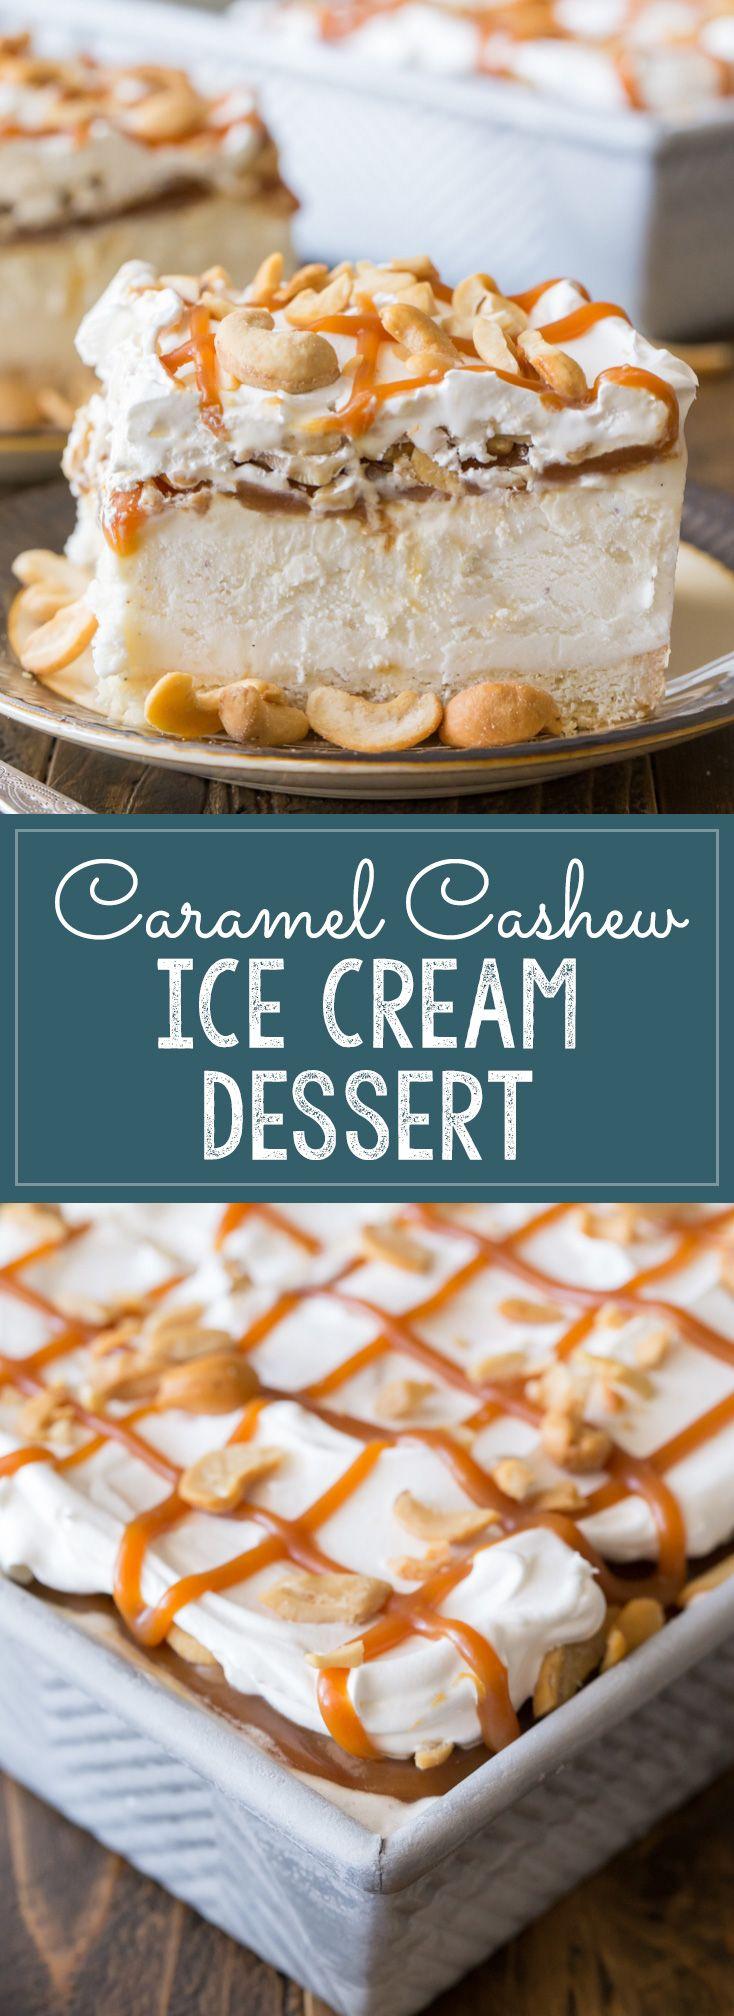 Caramel, Homemade caramel sauce and Ice cream desserts on Pinterest